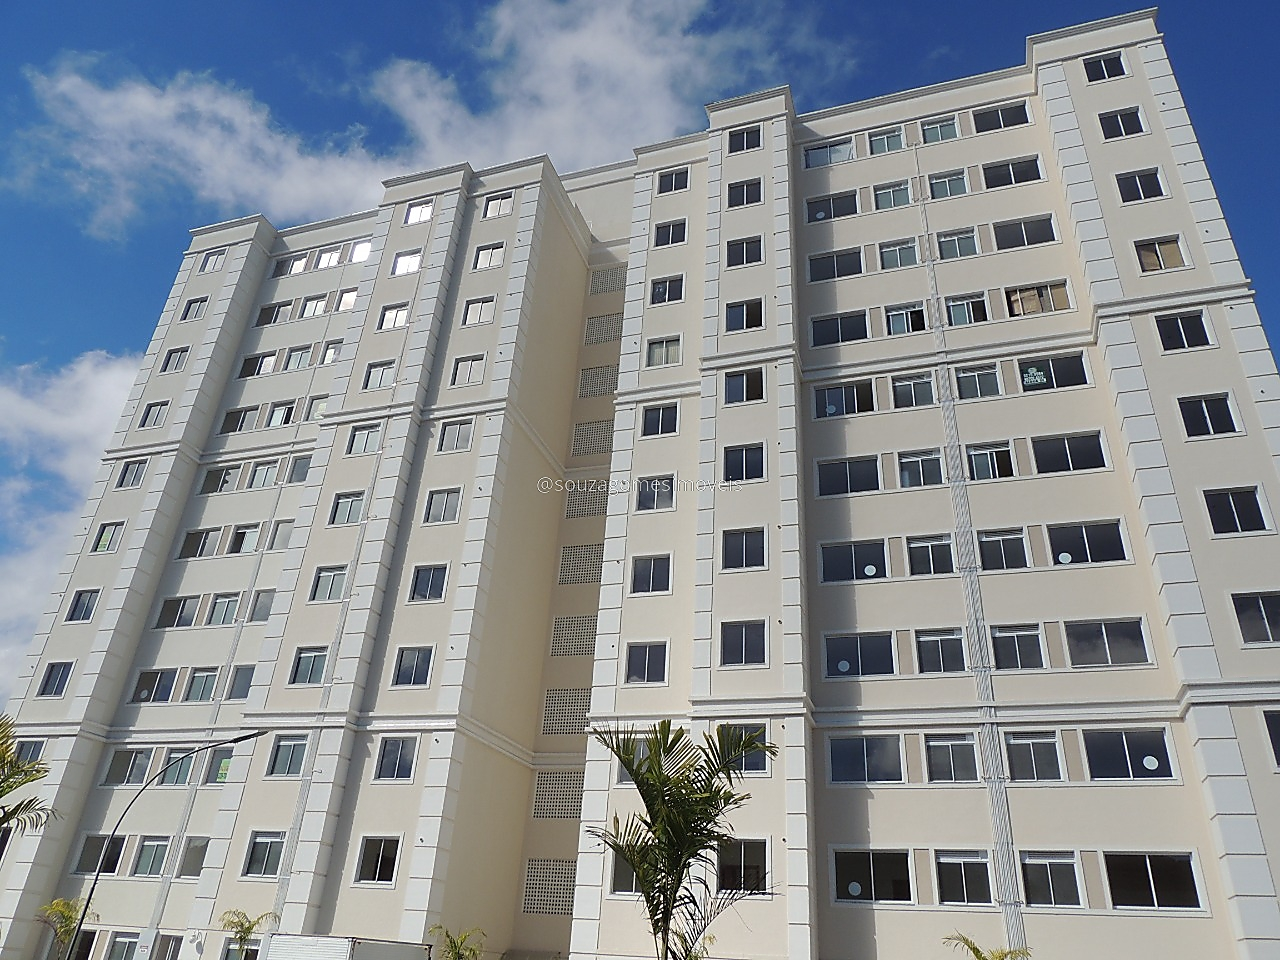 Ref.: 2135 - Apart. 2 qtos - São Pedro